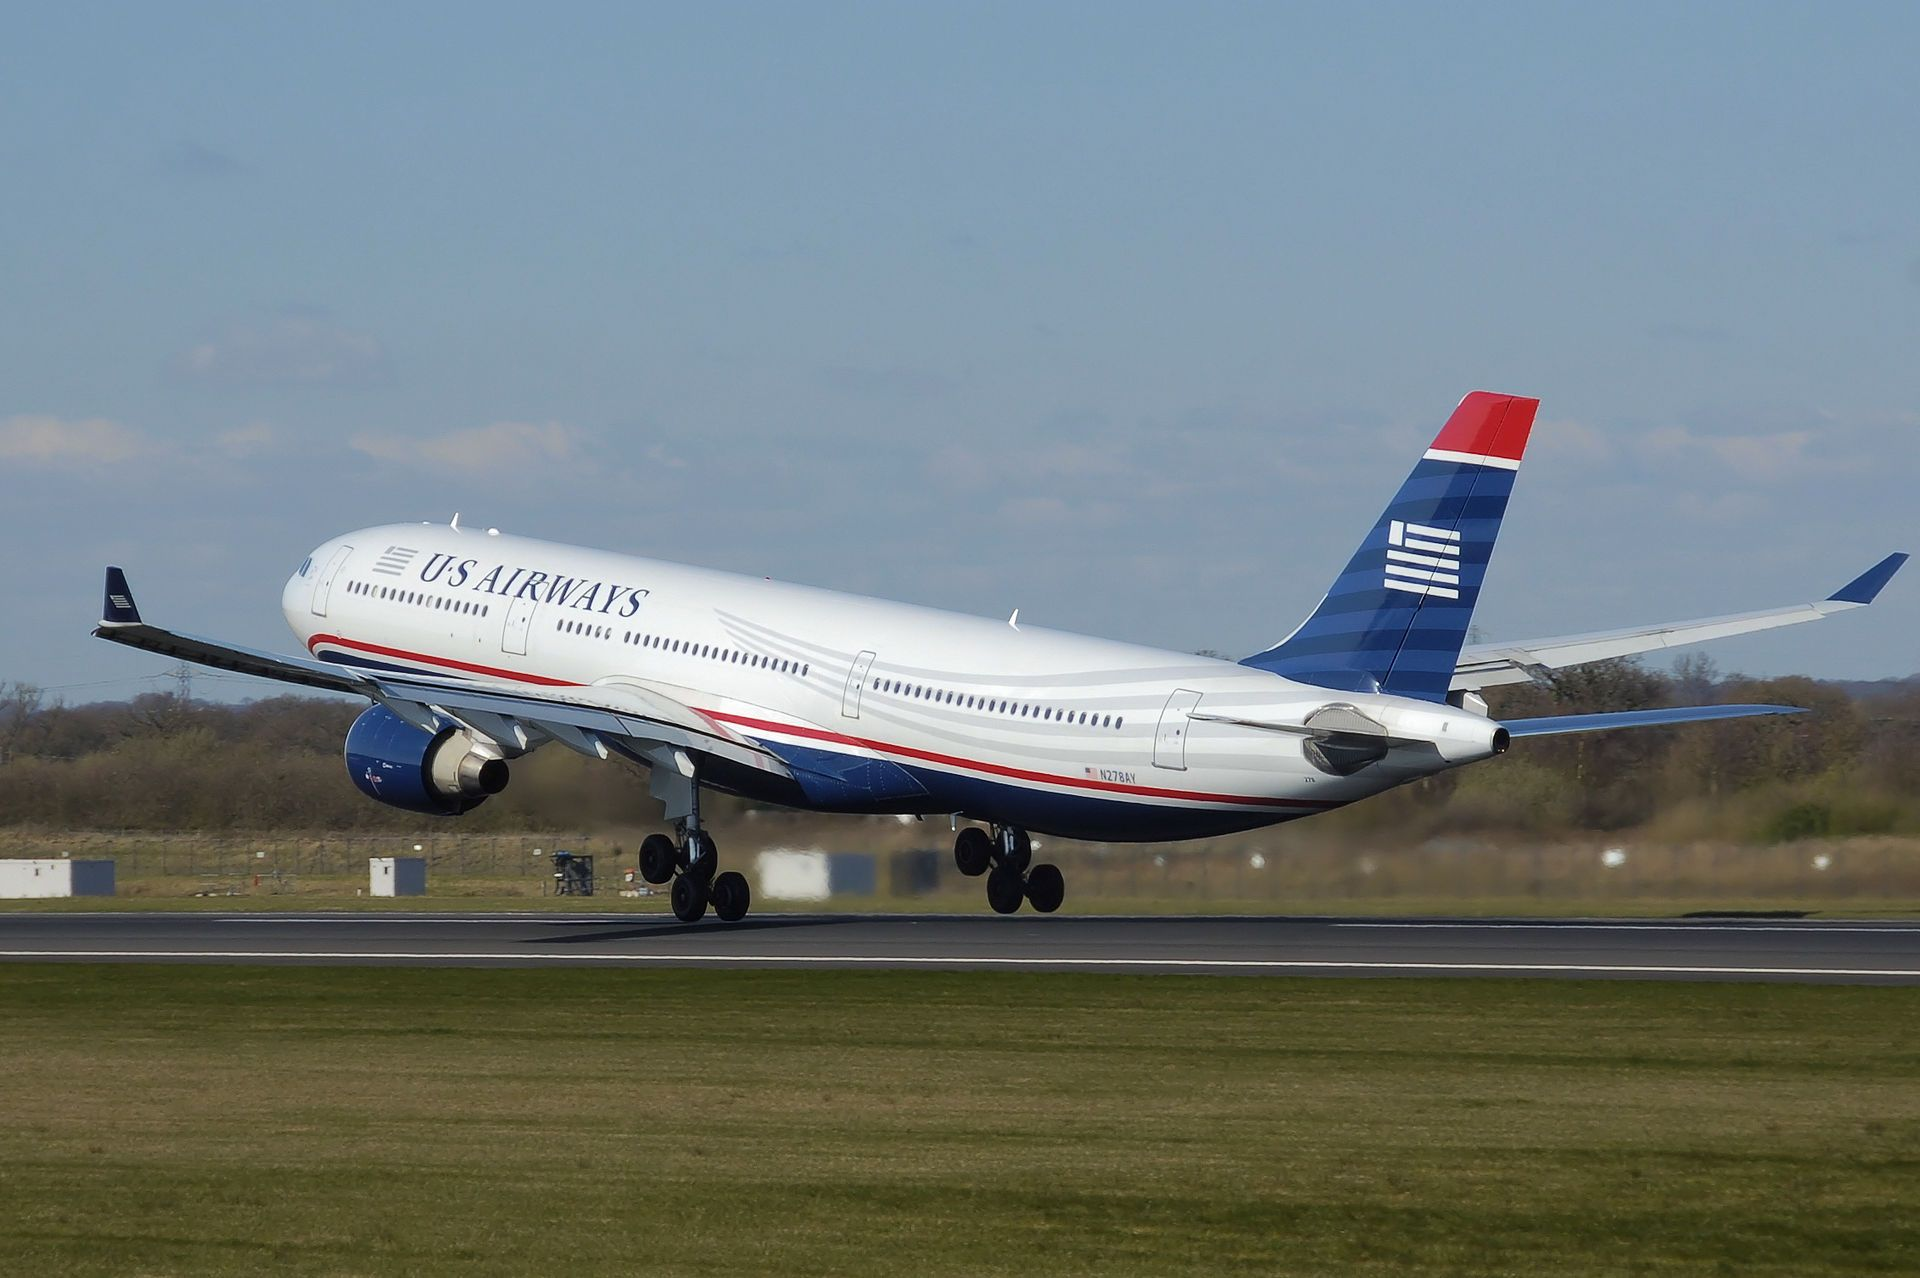 Us airways a330300 n278ay takeoff manchester arp List